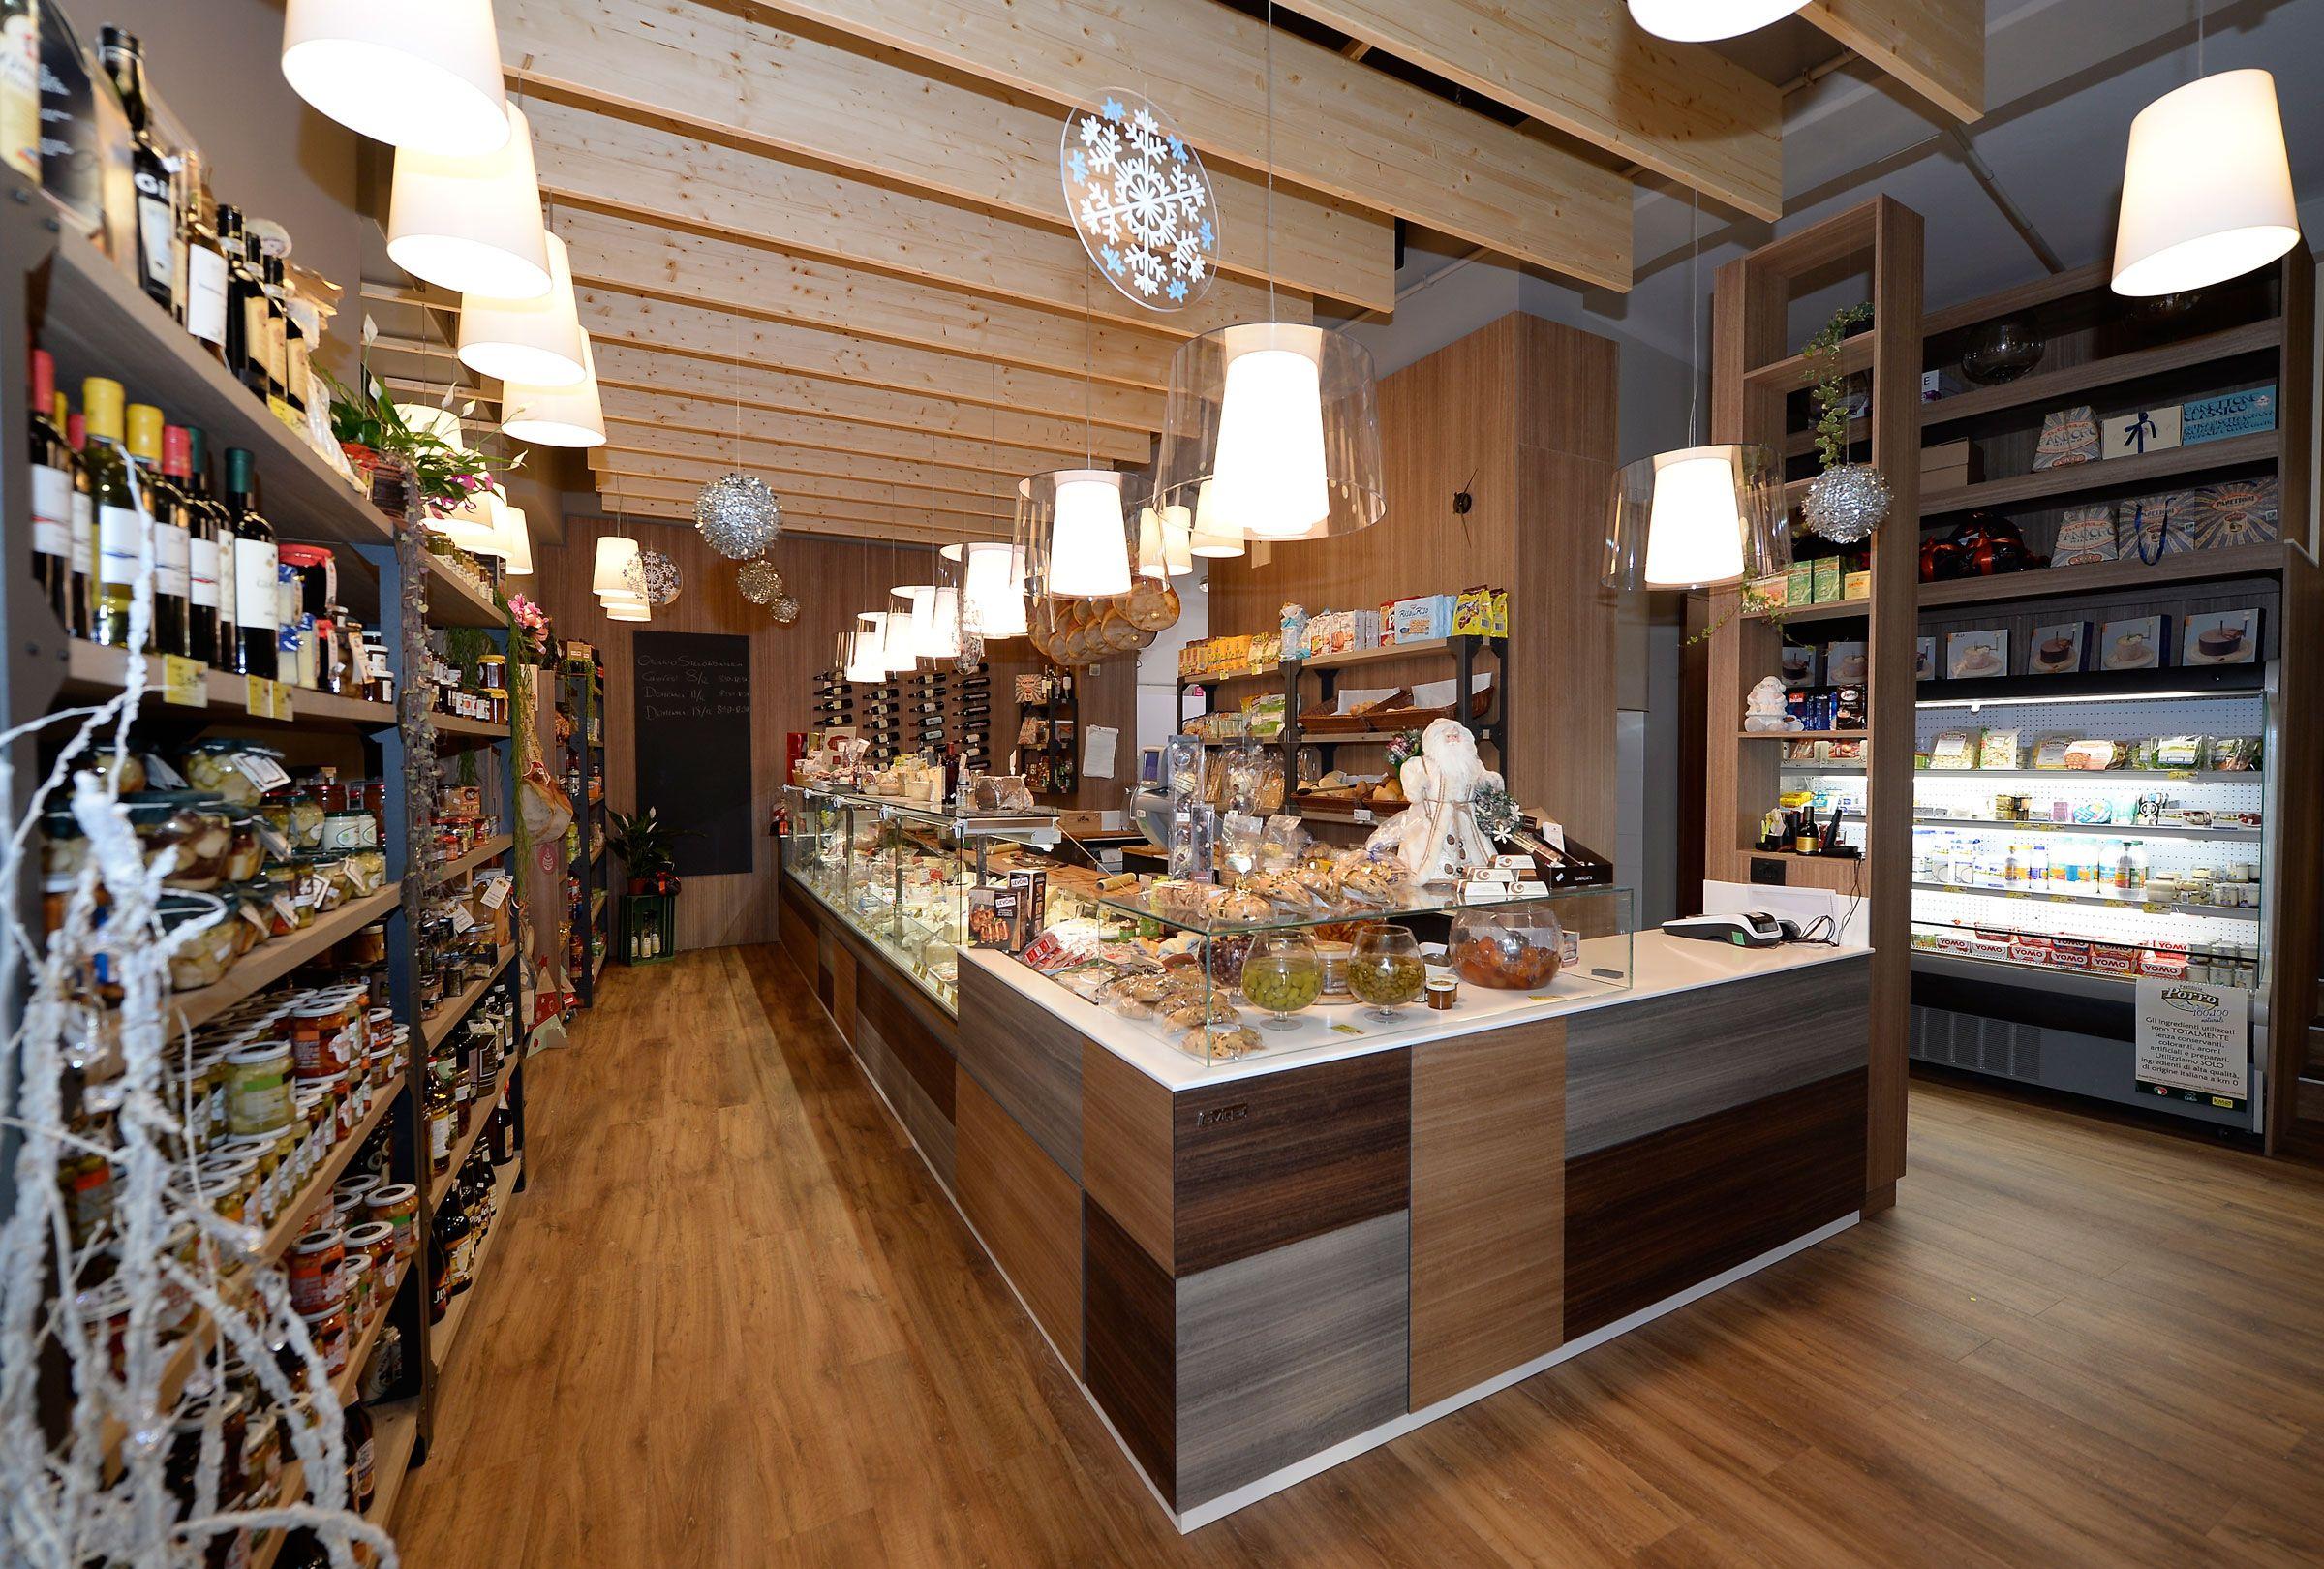 Outlet Arredamento Parma.Arredamento Alimentari Parma 1 Savona Gallery Alimentari